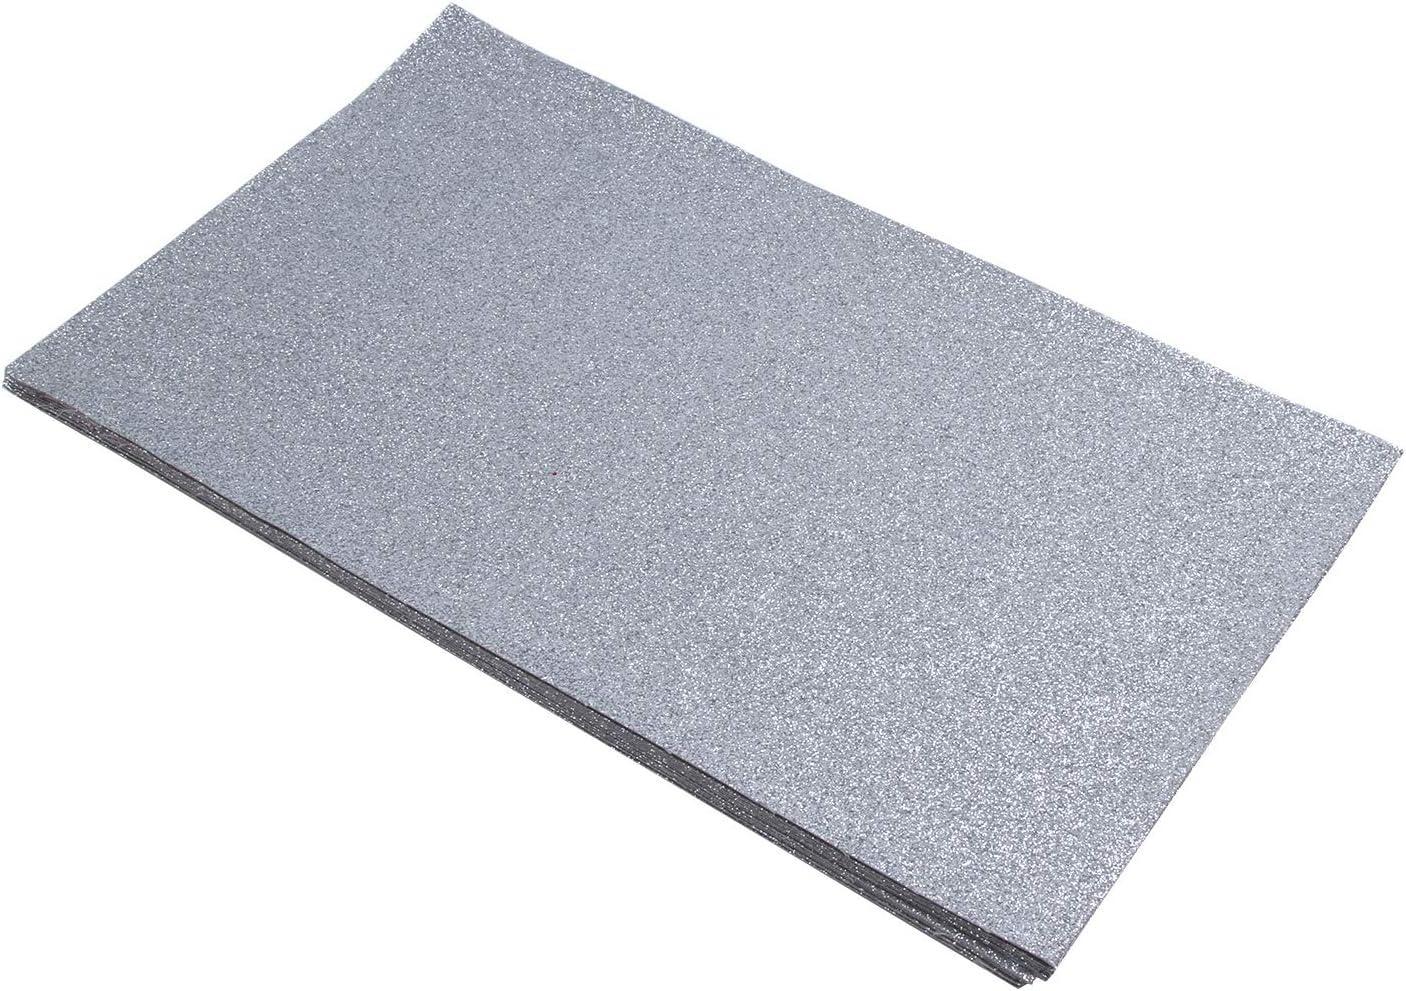 Shine Glitter Sheet Fabrics Back Stiff DIY Pack New York Mall 12 x13 8 Max 90% OFF I Craft